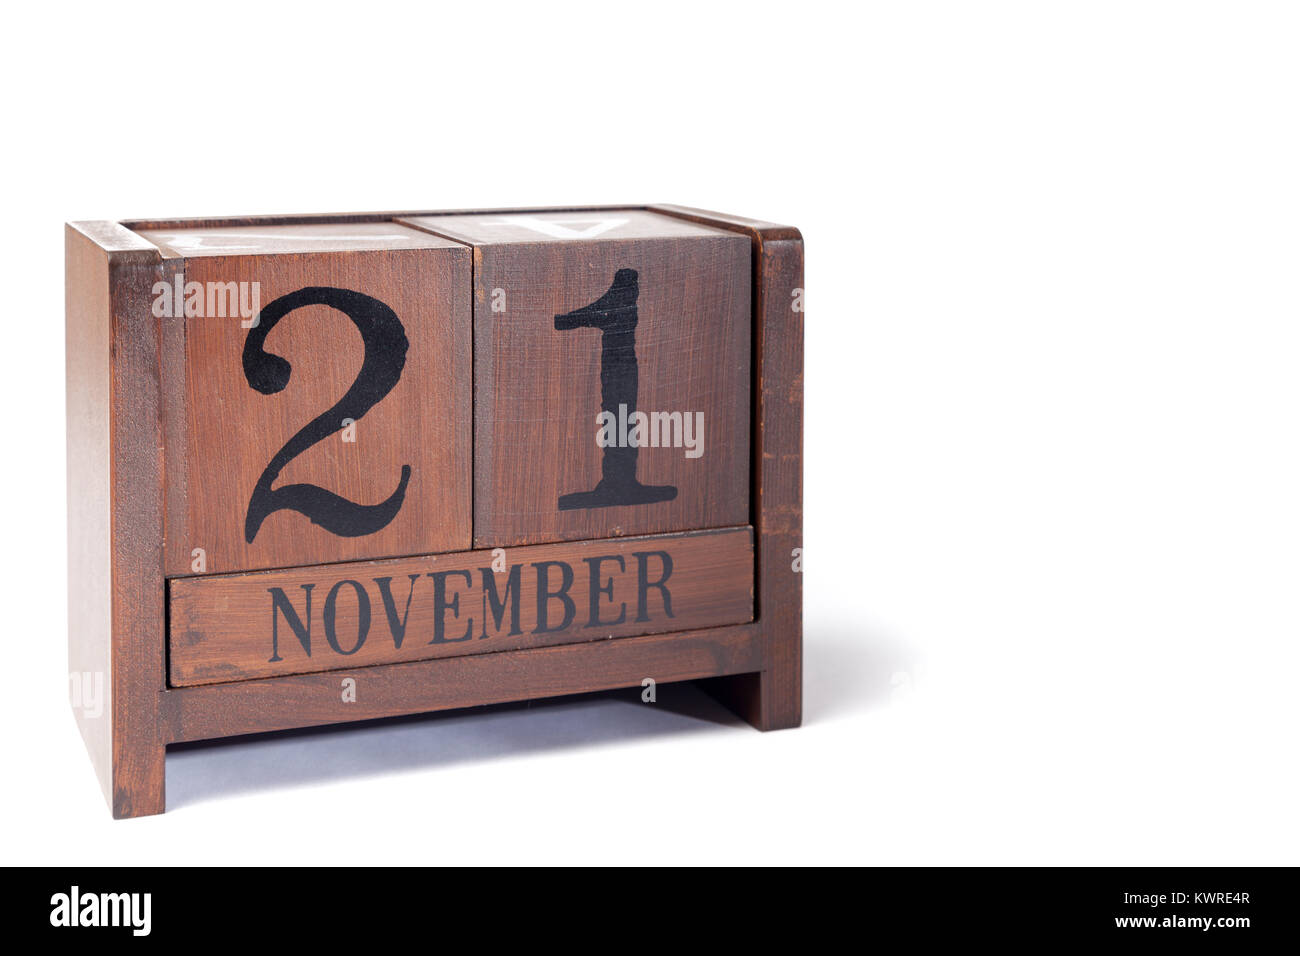 Wooden Perpetual Calendar set to November 21st - Stock Image